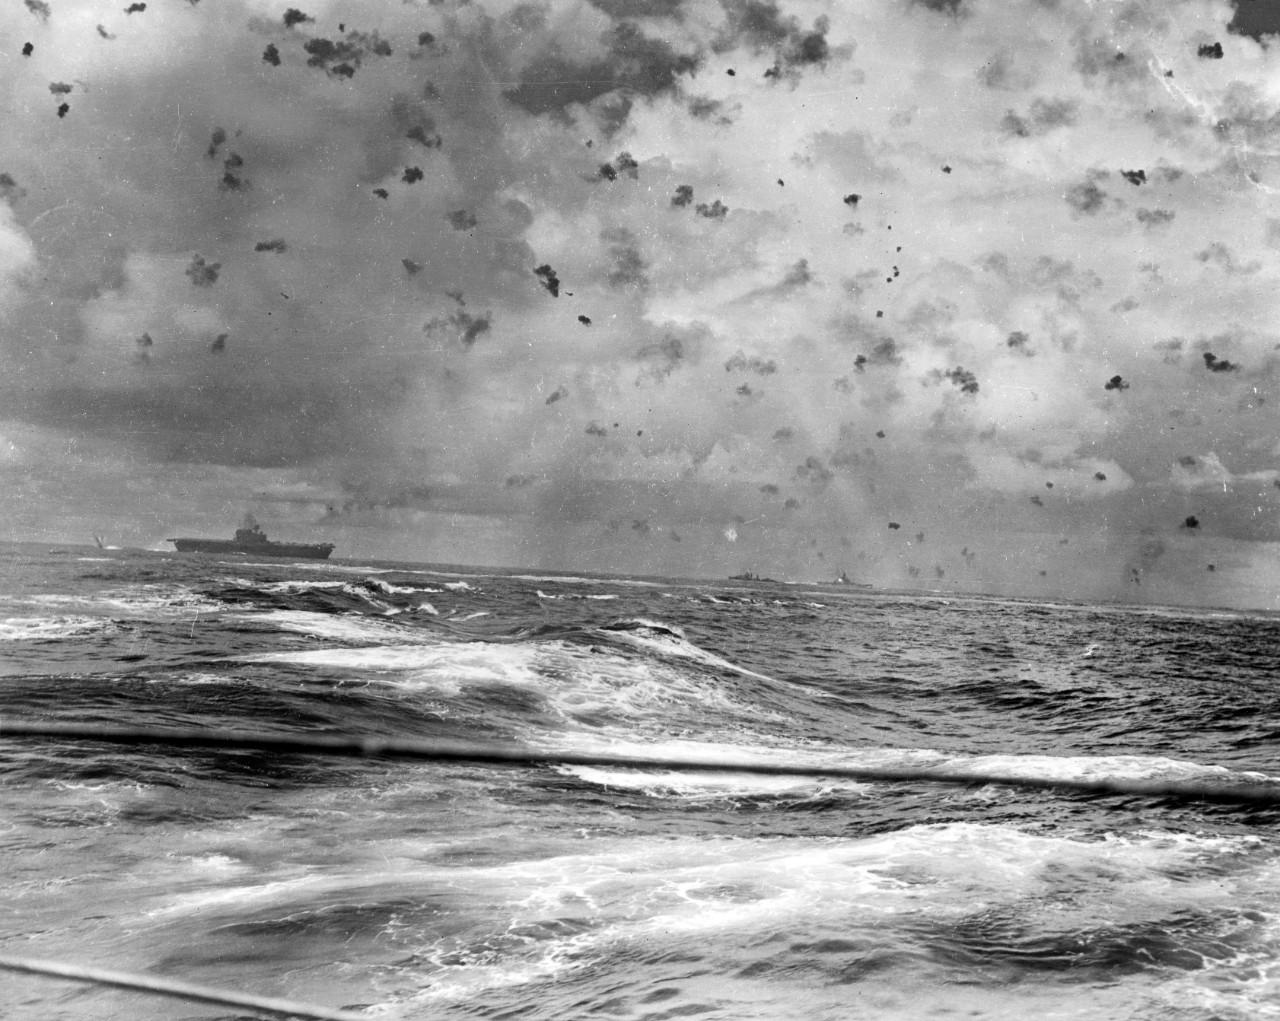 Photo #: 80-G-20989  Battle of the Santa Cruz Islands, October 1942